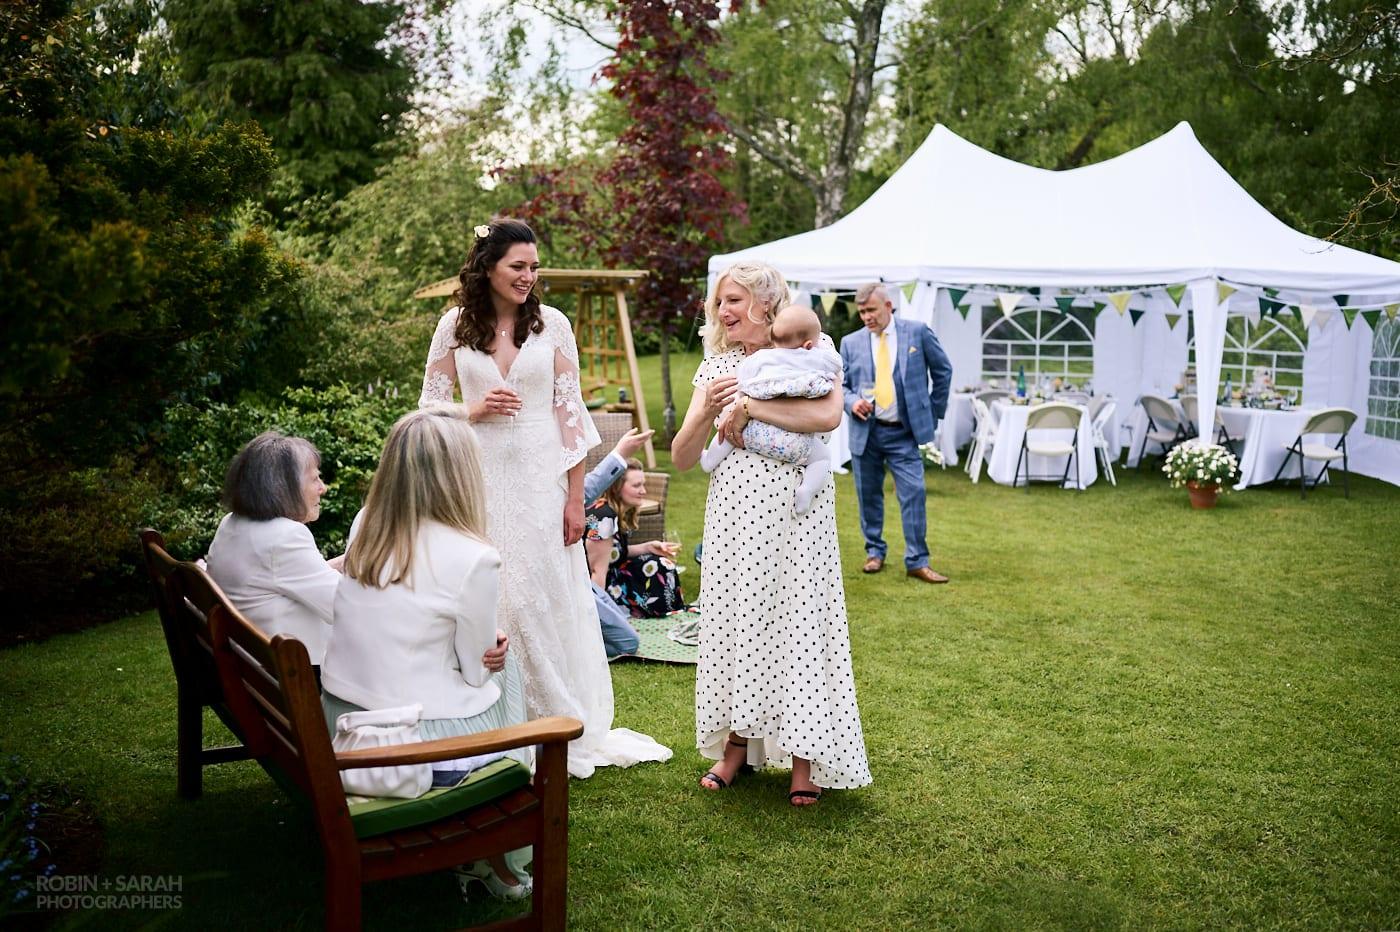 Bride and family relax at garden wedding reception